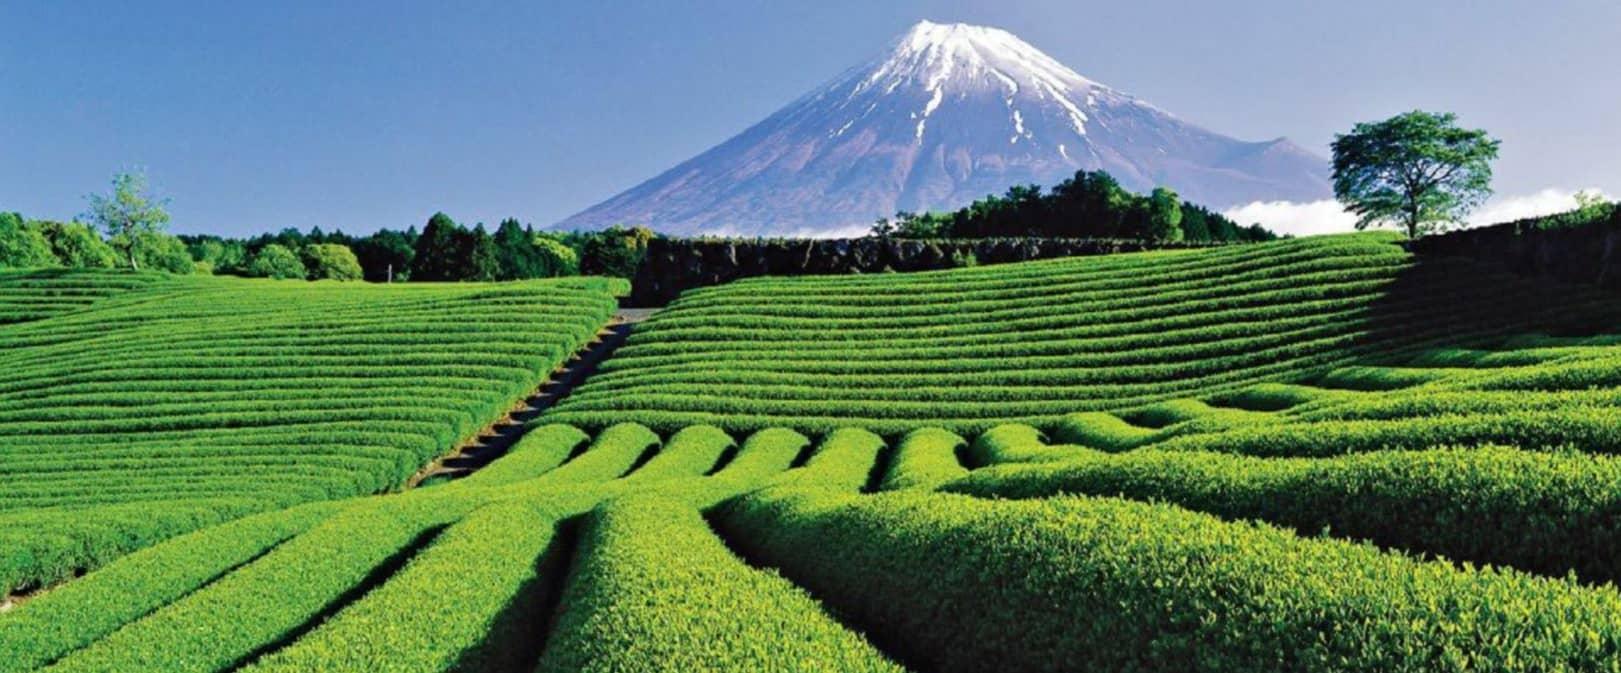 The Green Tea Revolution